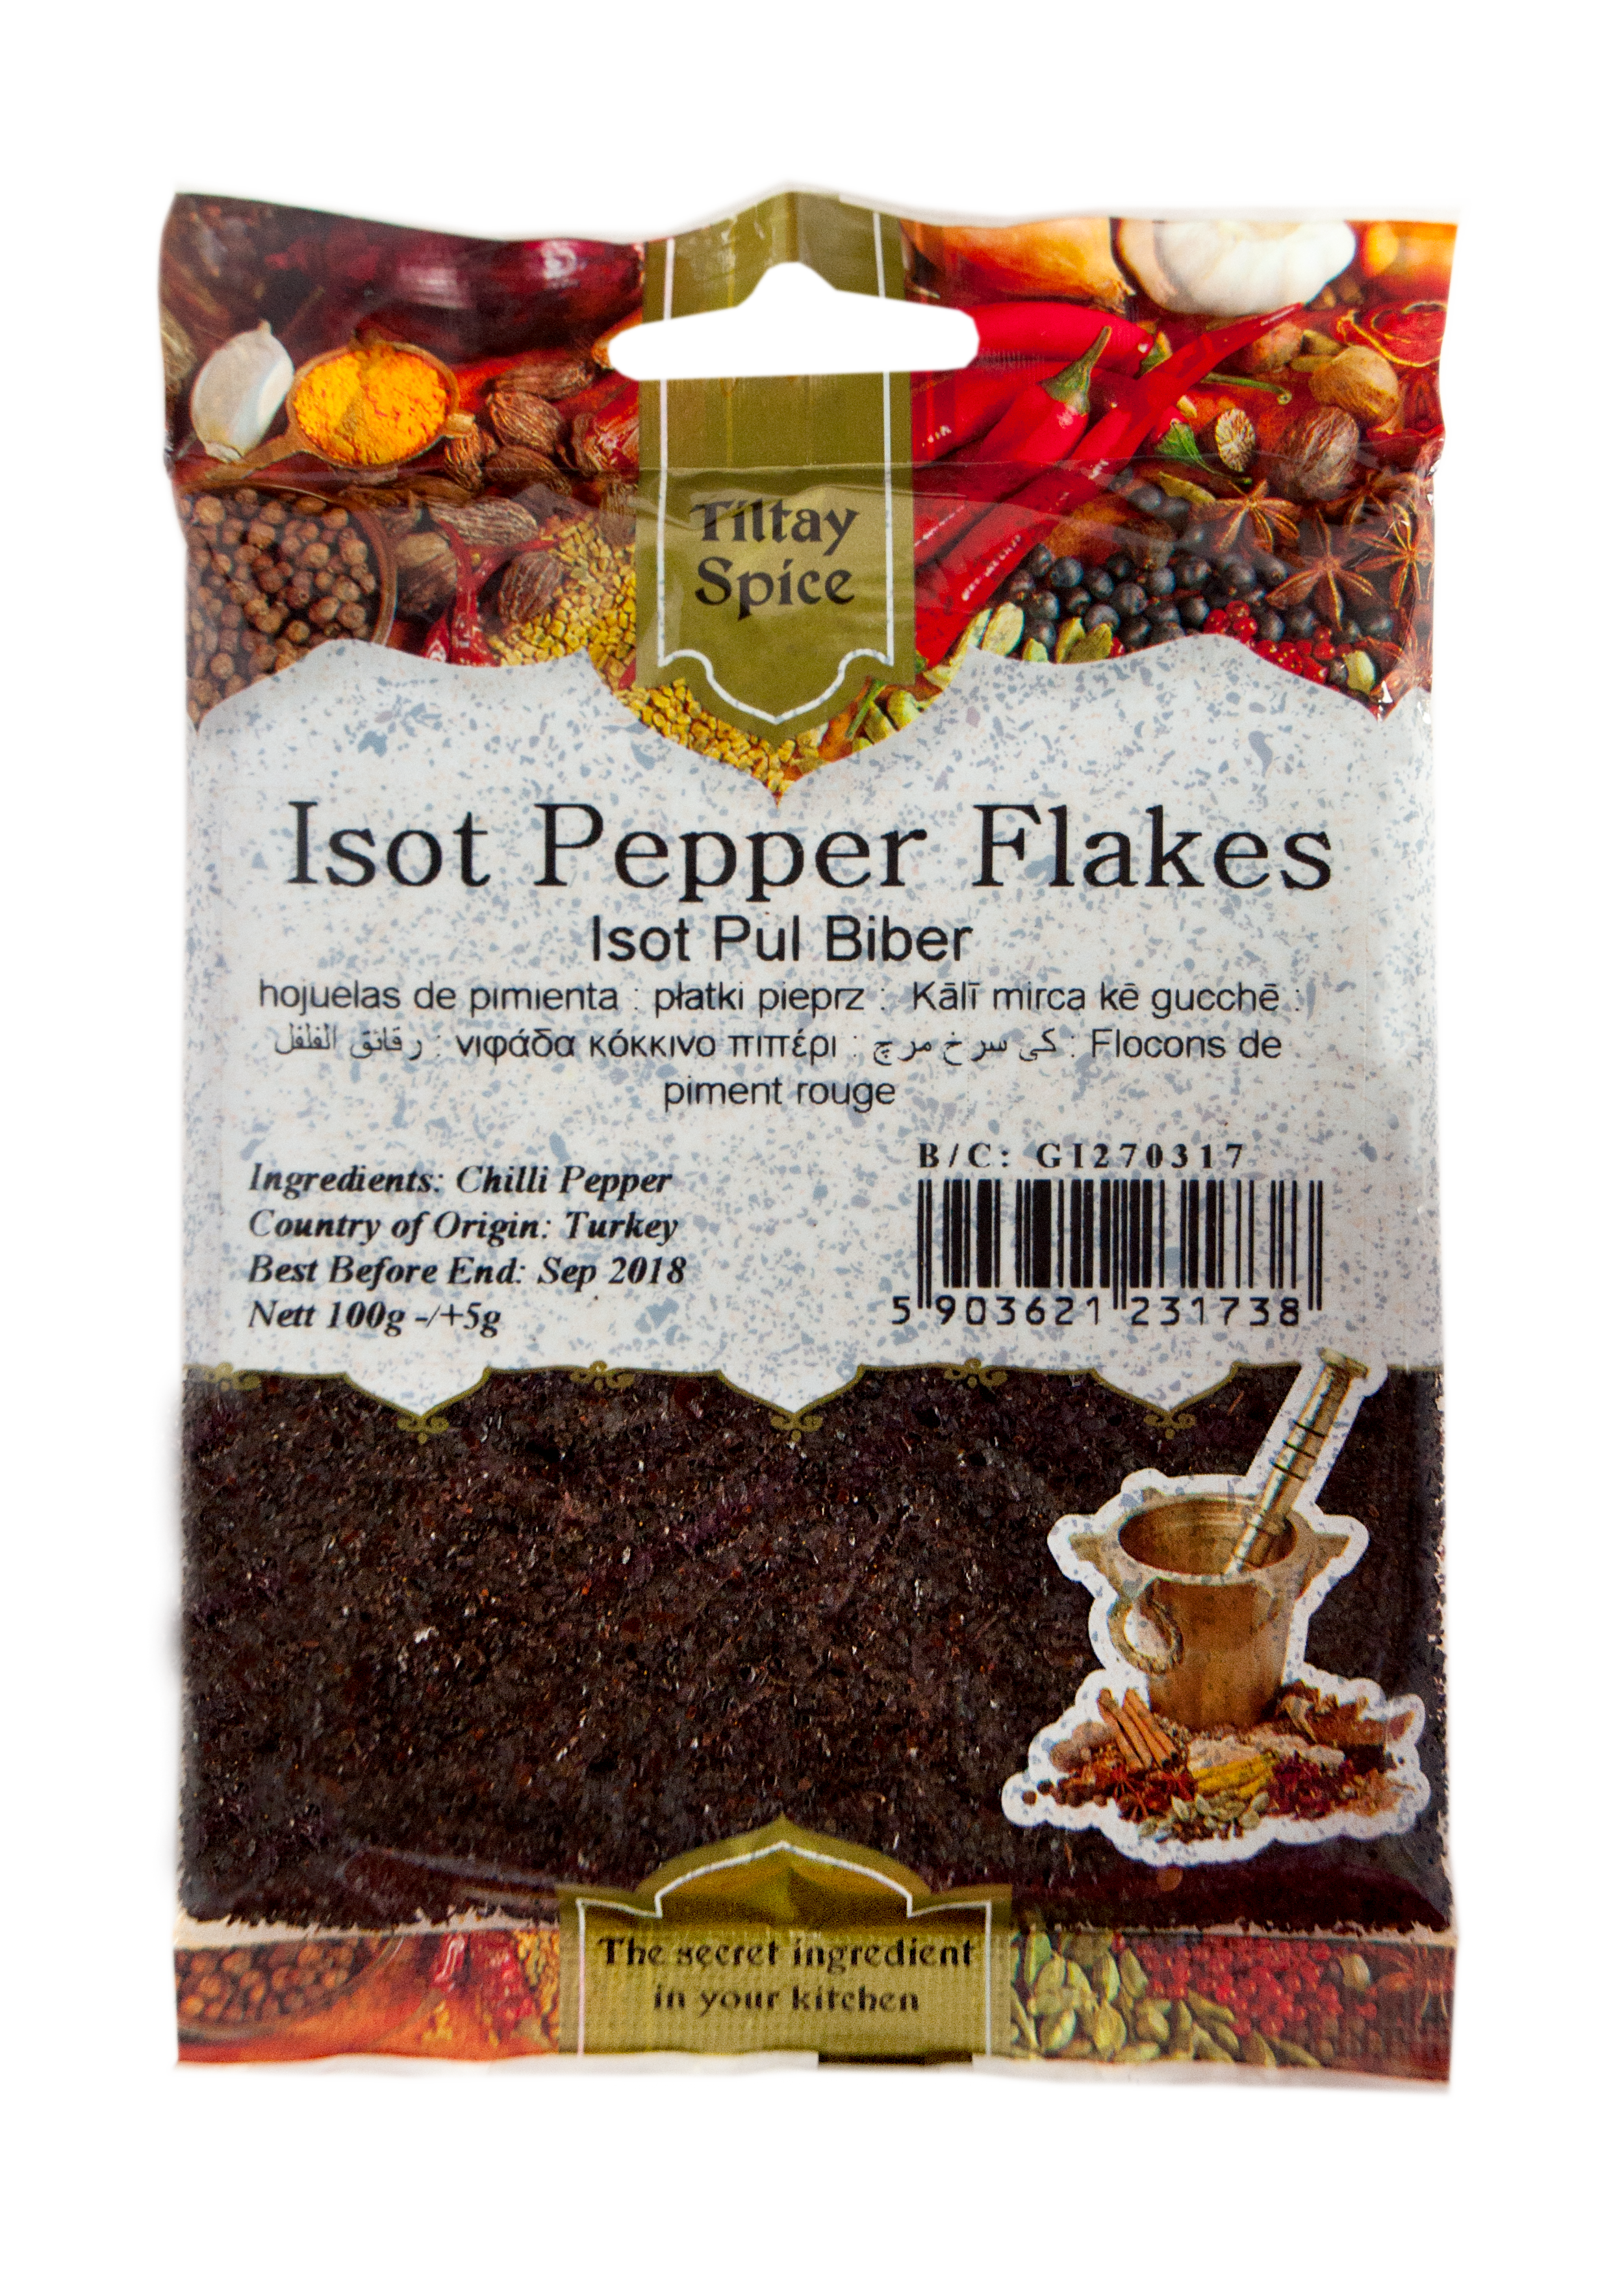 Tiltay Spice Urfa Biber (Isot) Pepper Flakes – Tiltay Spice   Finest ... d600b752da